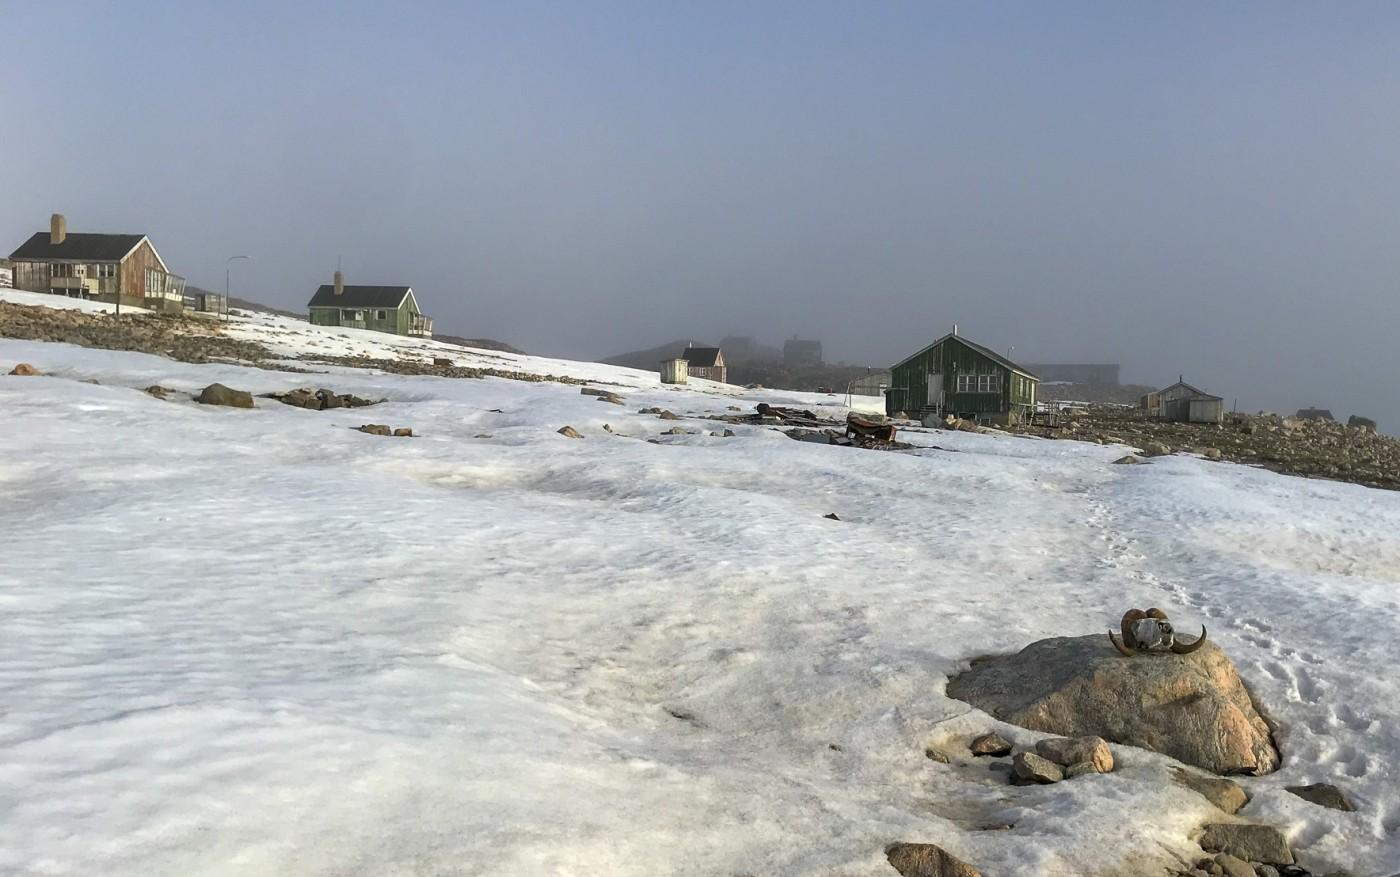 Abandoned settlement of Cape Tobin. Photo by Bo Normander.